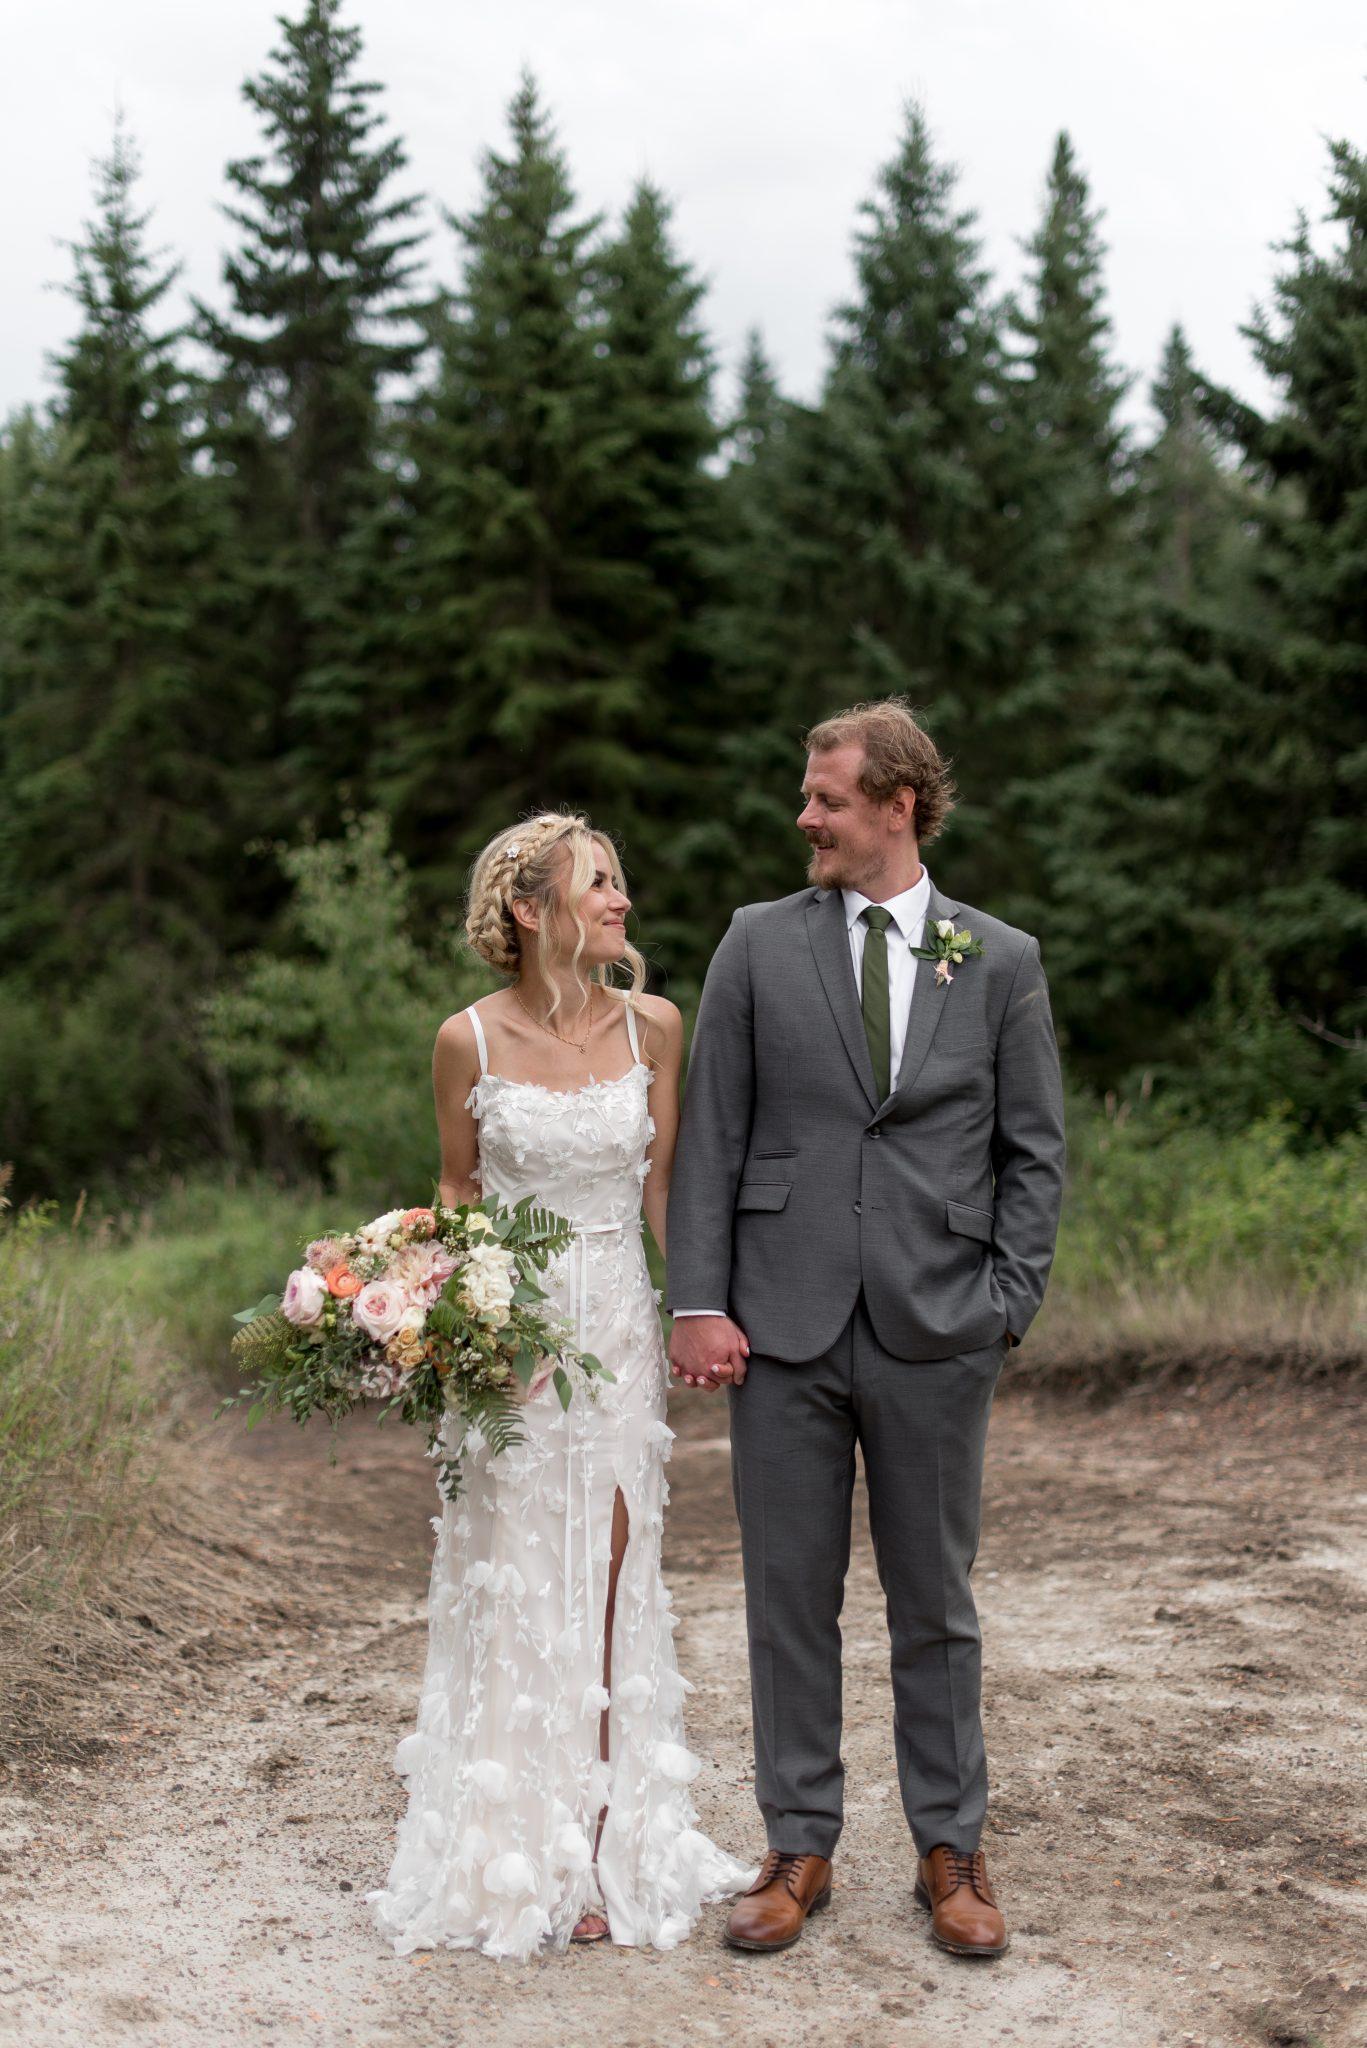 Bridal inspiration in a flower inspired BDHLN wedding gown